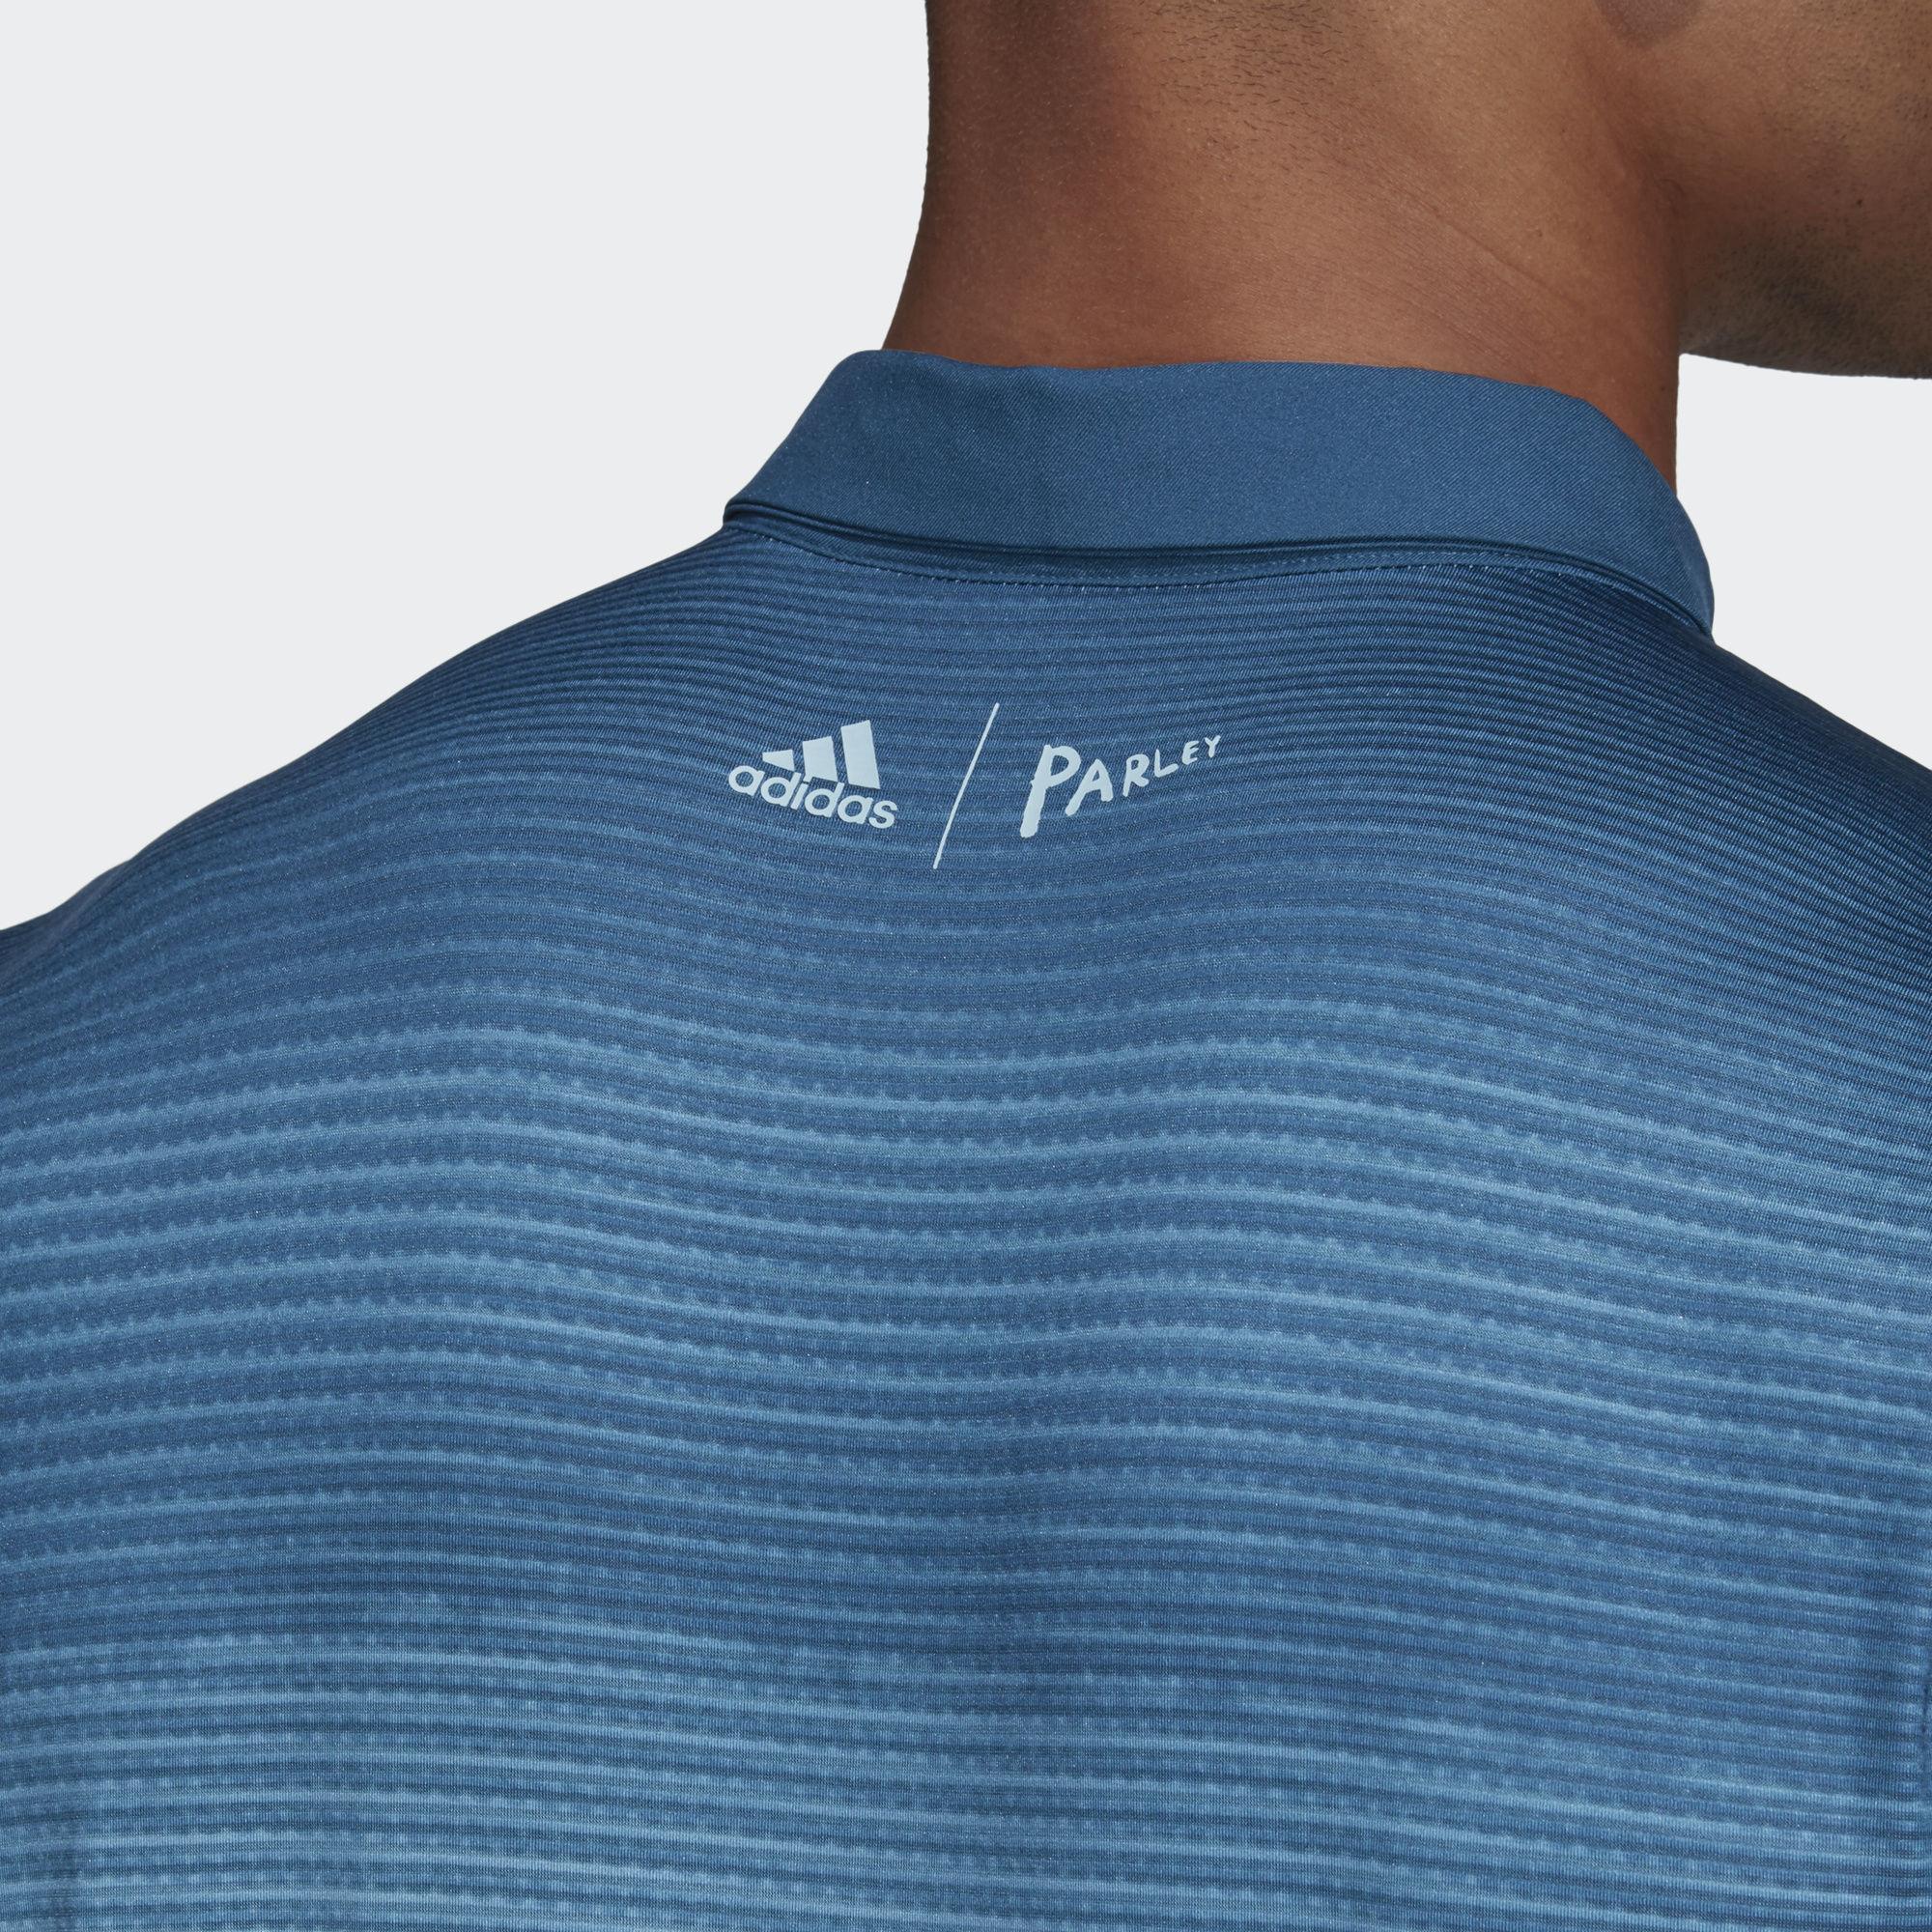 ced47d176 Adidas Mens Parley Polo Shirt - Easy Blue/White - Tennisnuts.com